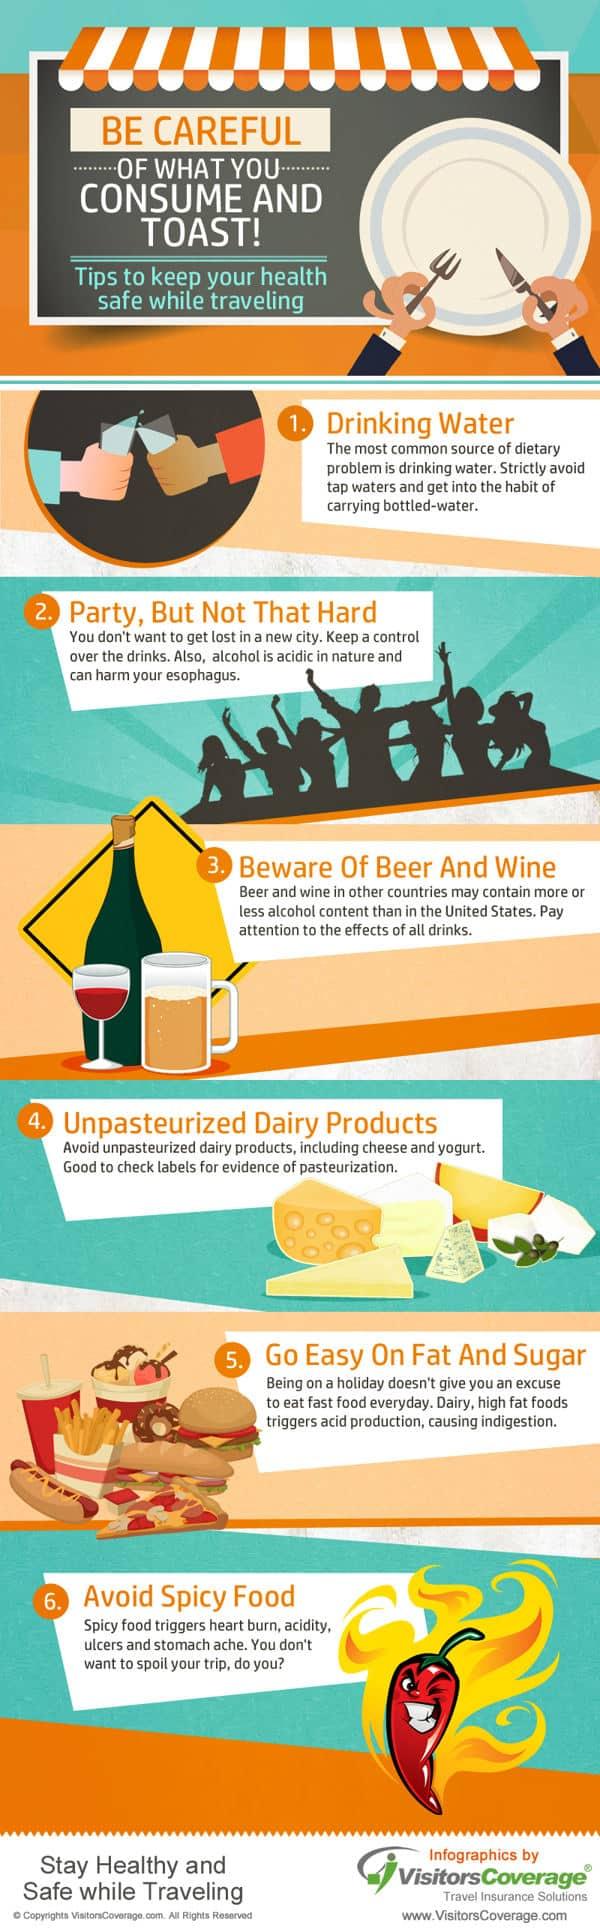 mantente saludable durante tus viajes infografia